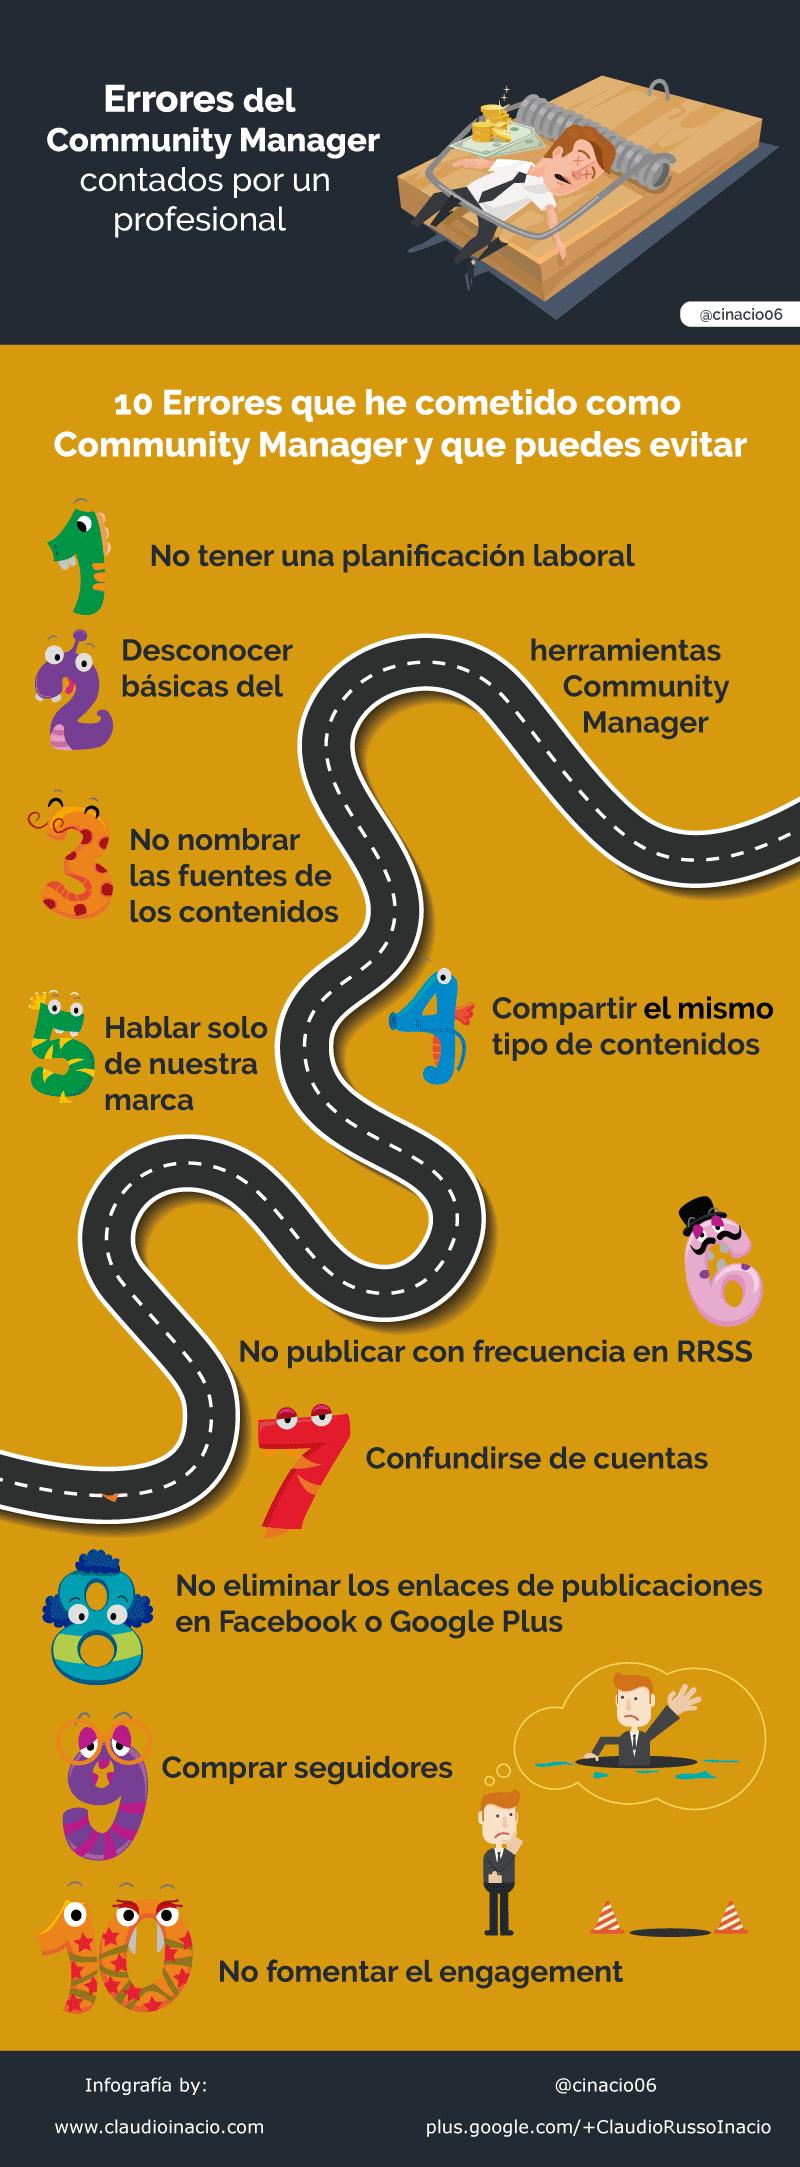 infografia errores del community manager